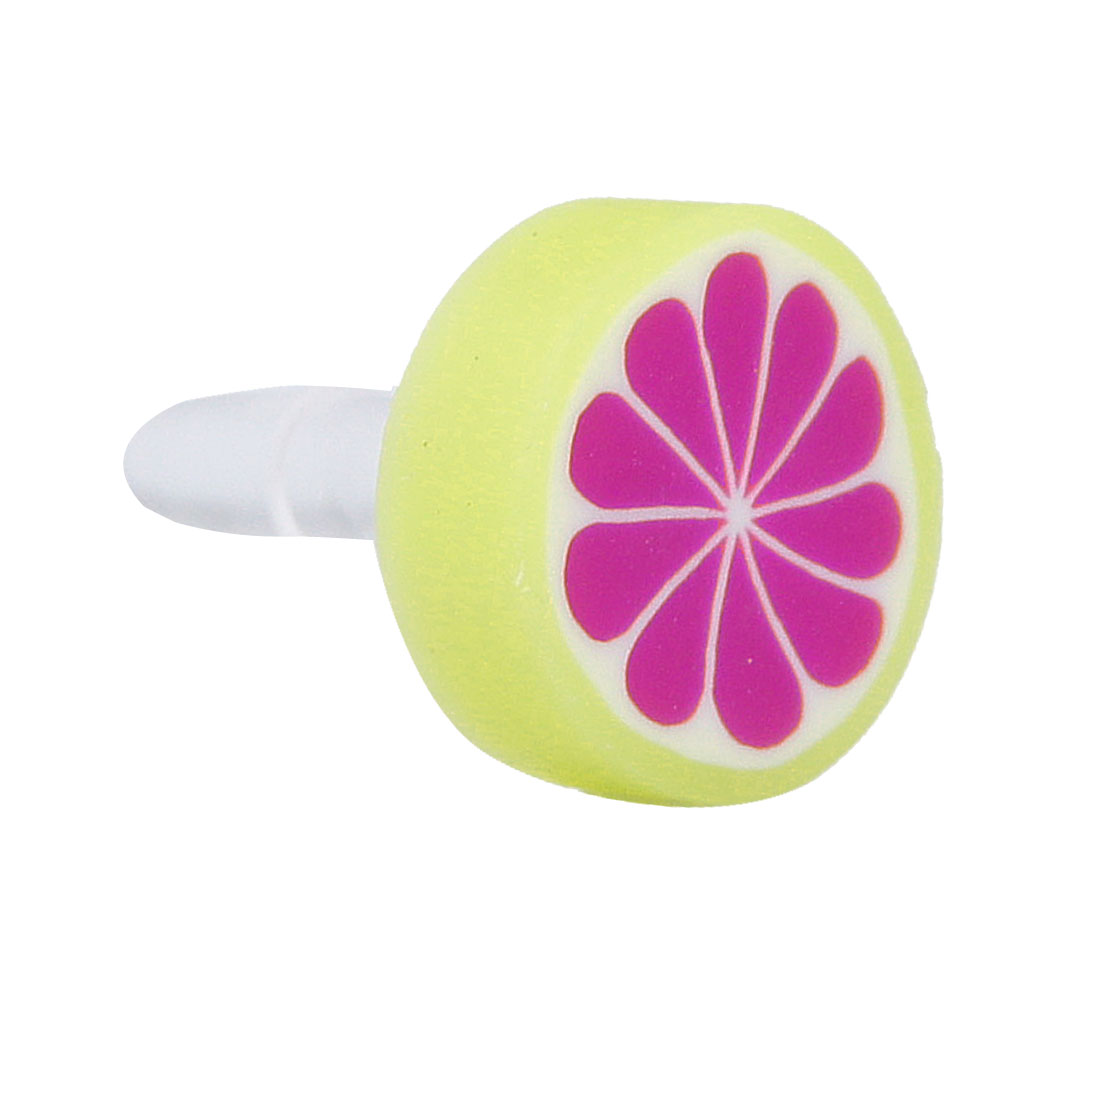 Purple Fruit Orange 3.5mm Dust-proof Ear Cap Plug Stopper Jack for Cell Phone Smartphone